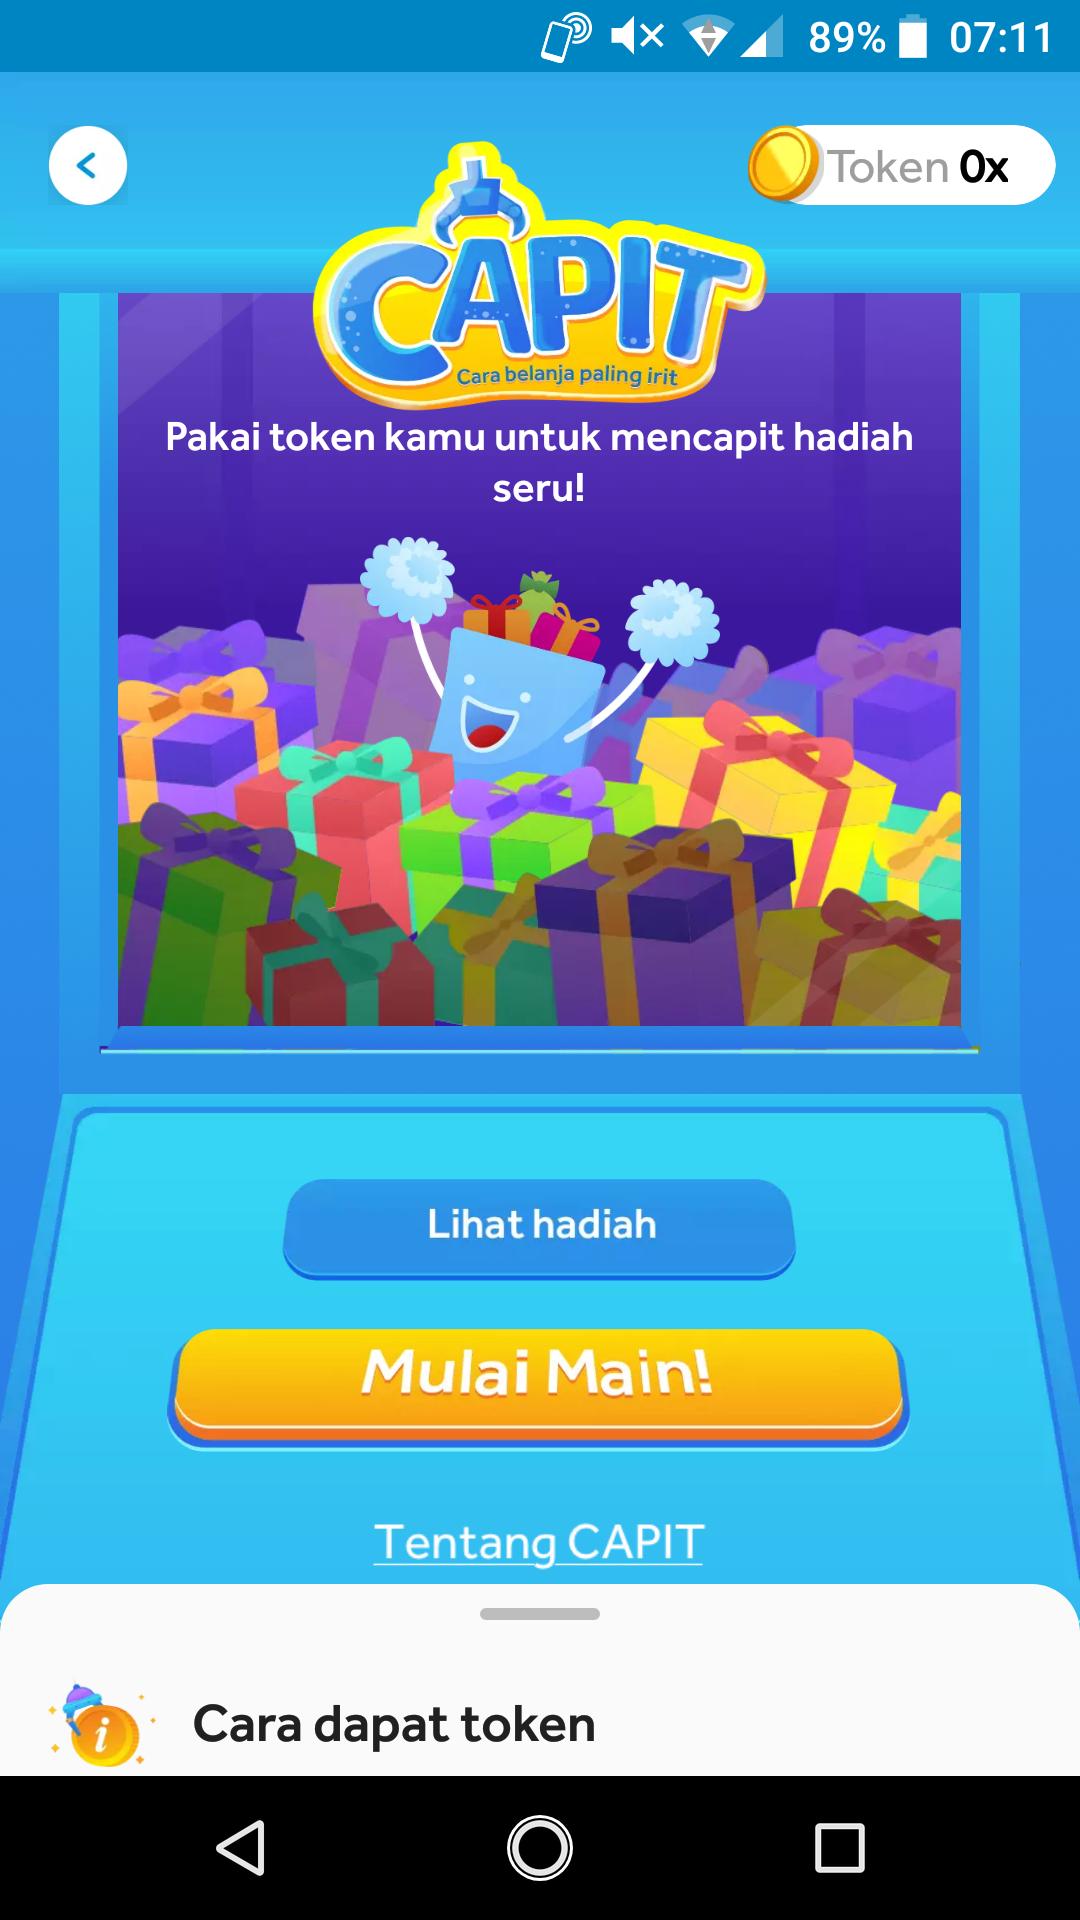 Wahana game capit Harbolnas di aplikasi Blibli.com